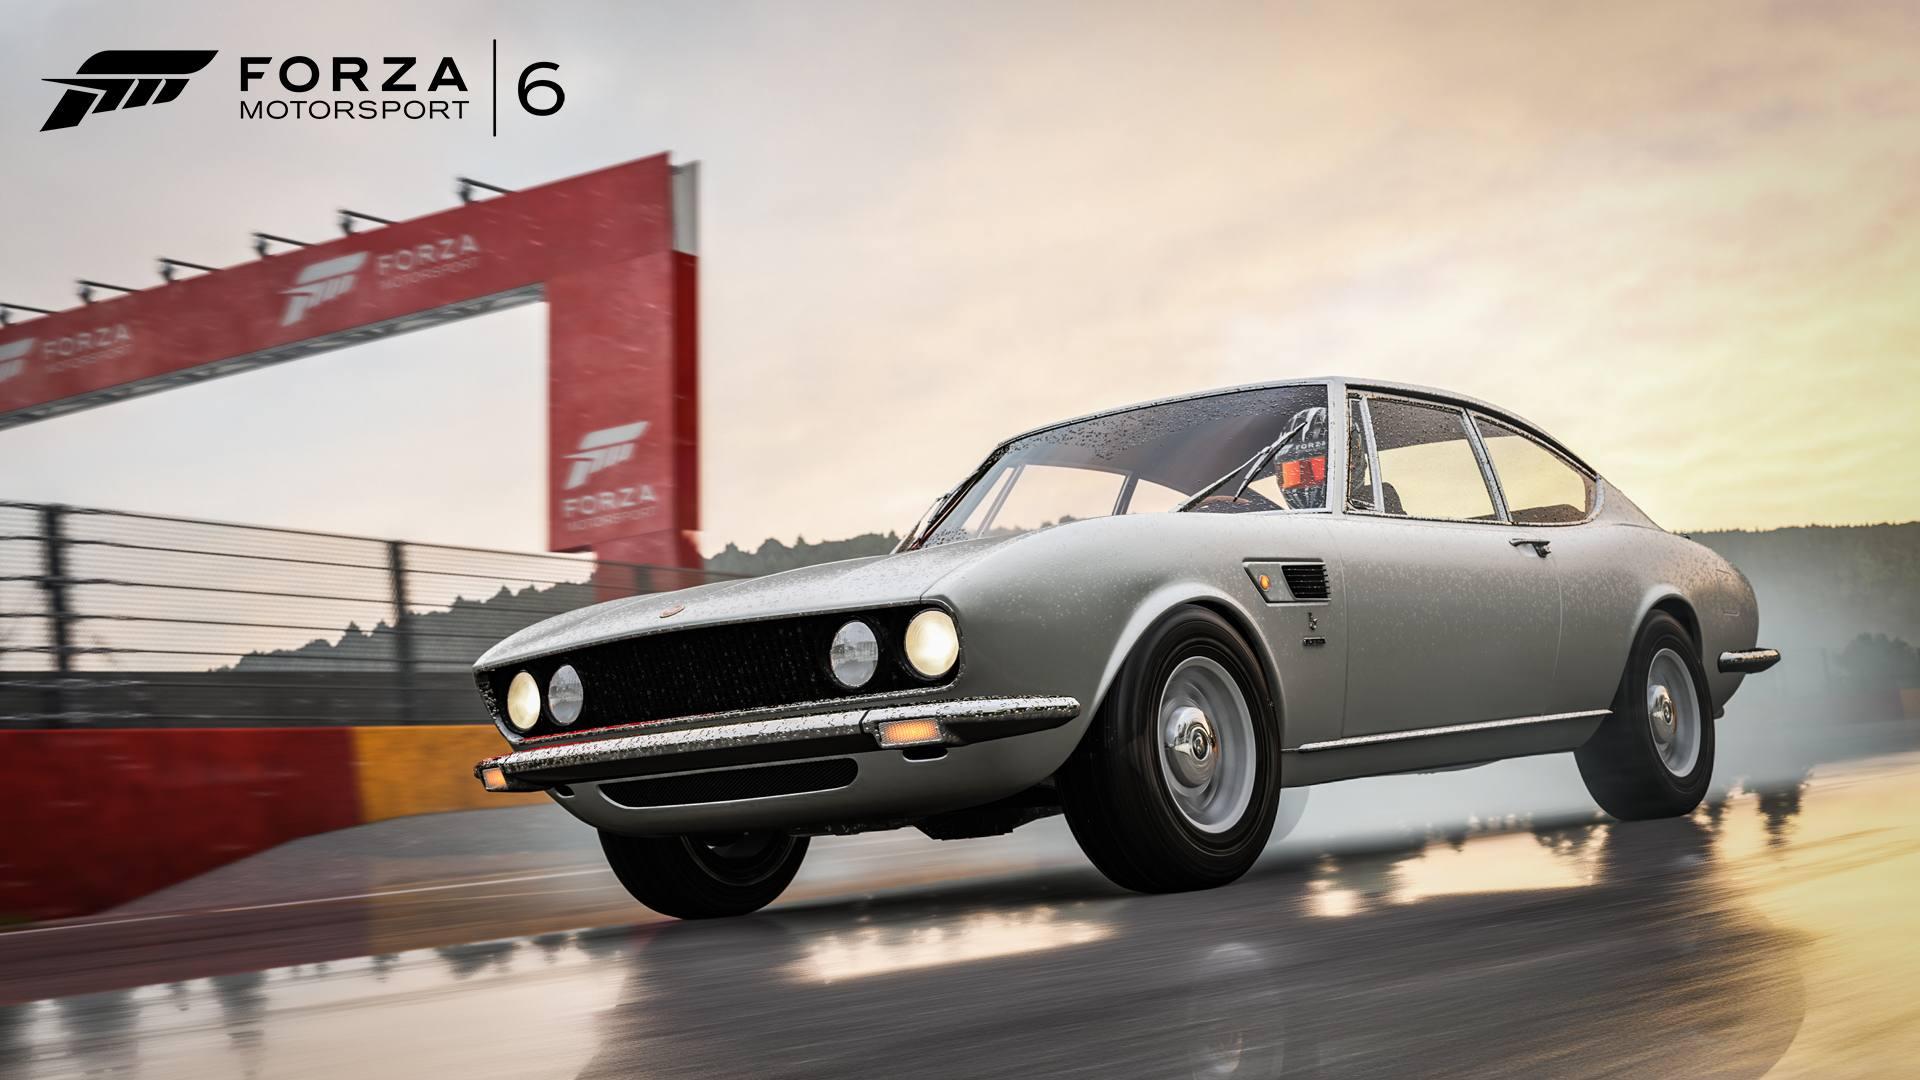 Forza Motorsport 6 14-03-16 1969 Fiat Dino 2.4 Coupe 001